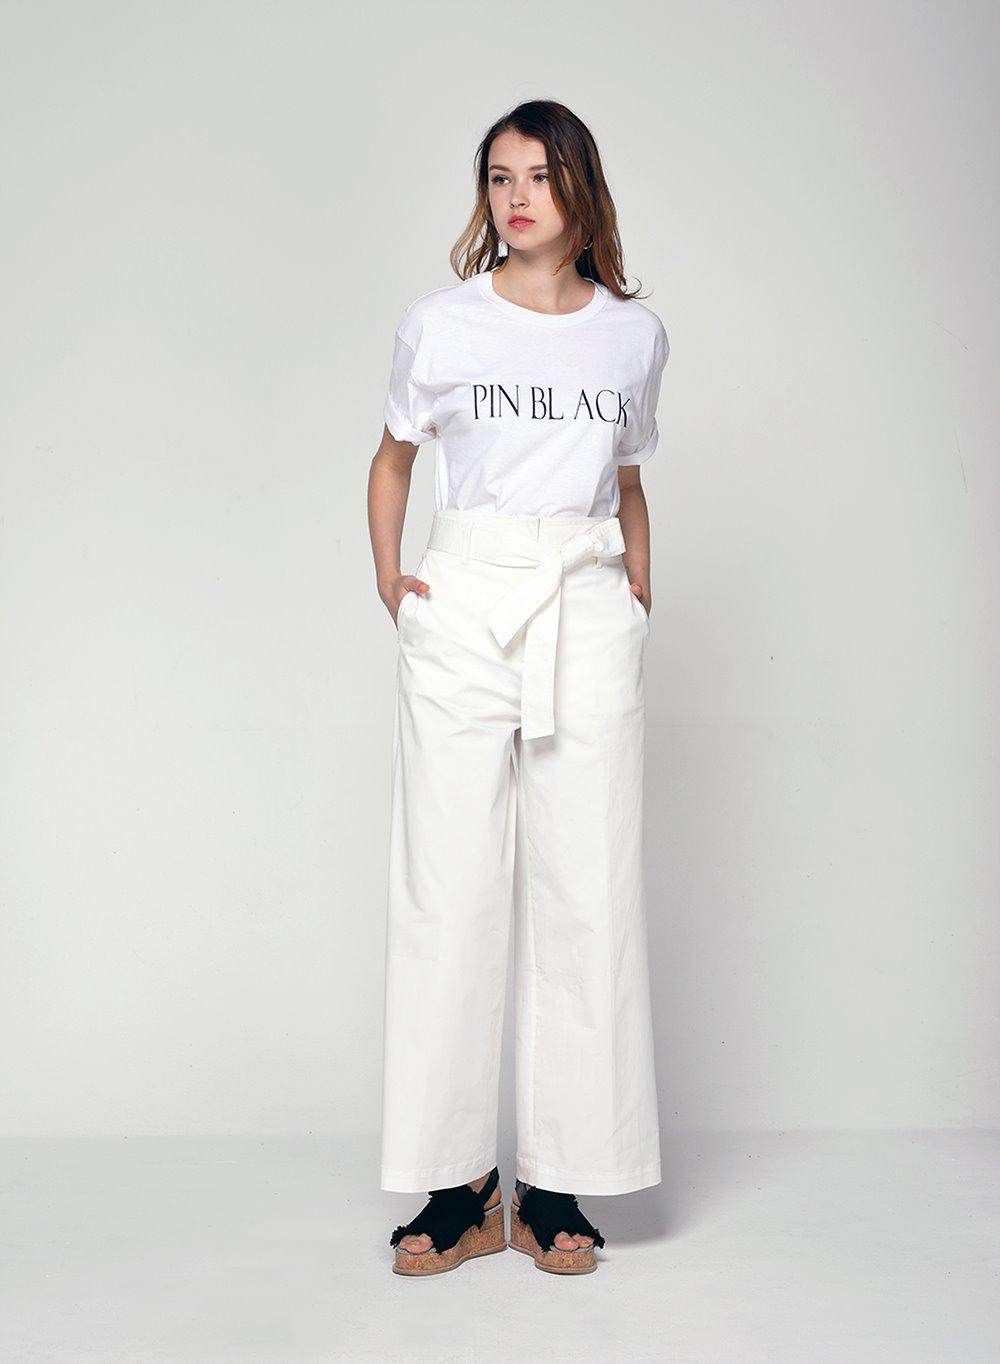 PINBLACK女装2017夏季新品